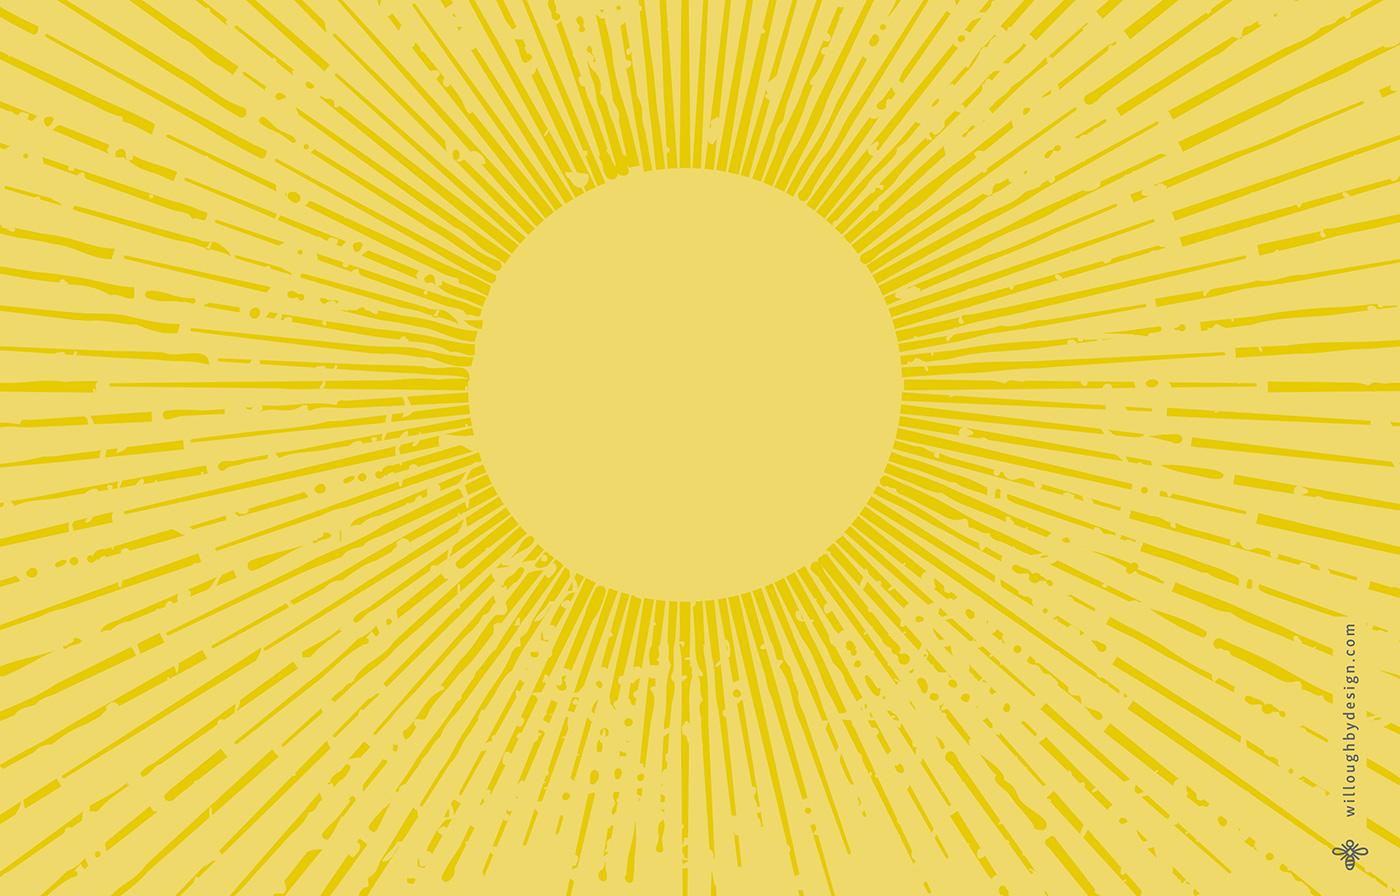 Sunbeam Wallpaper - Willoughby Design - Brand Design KC